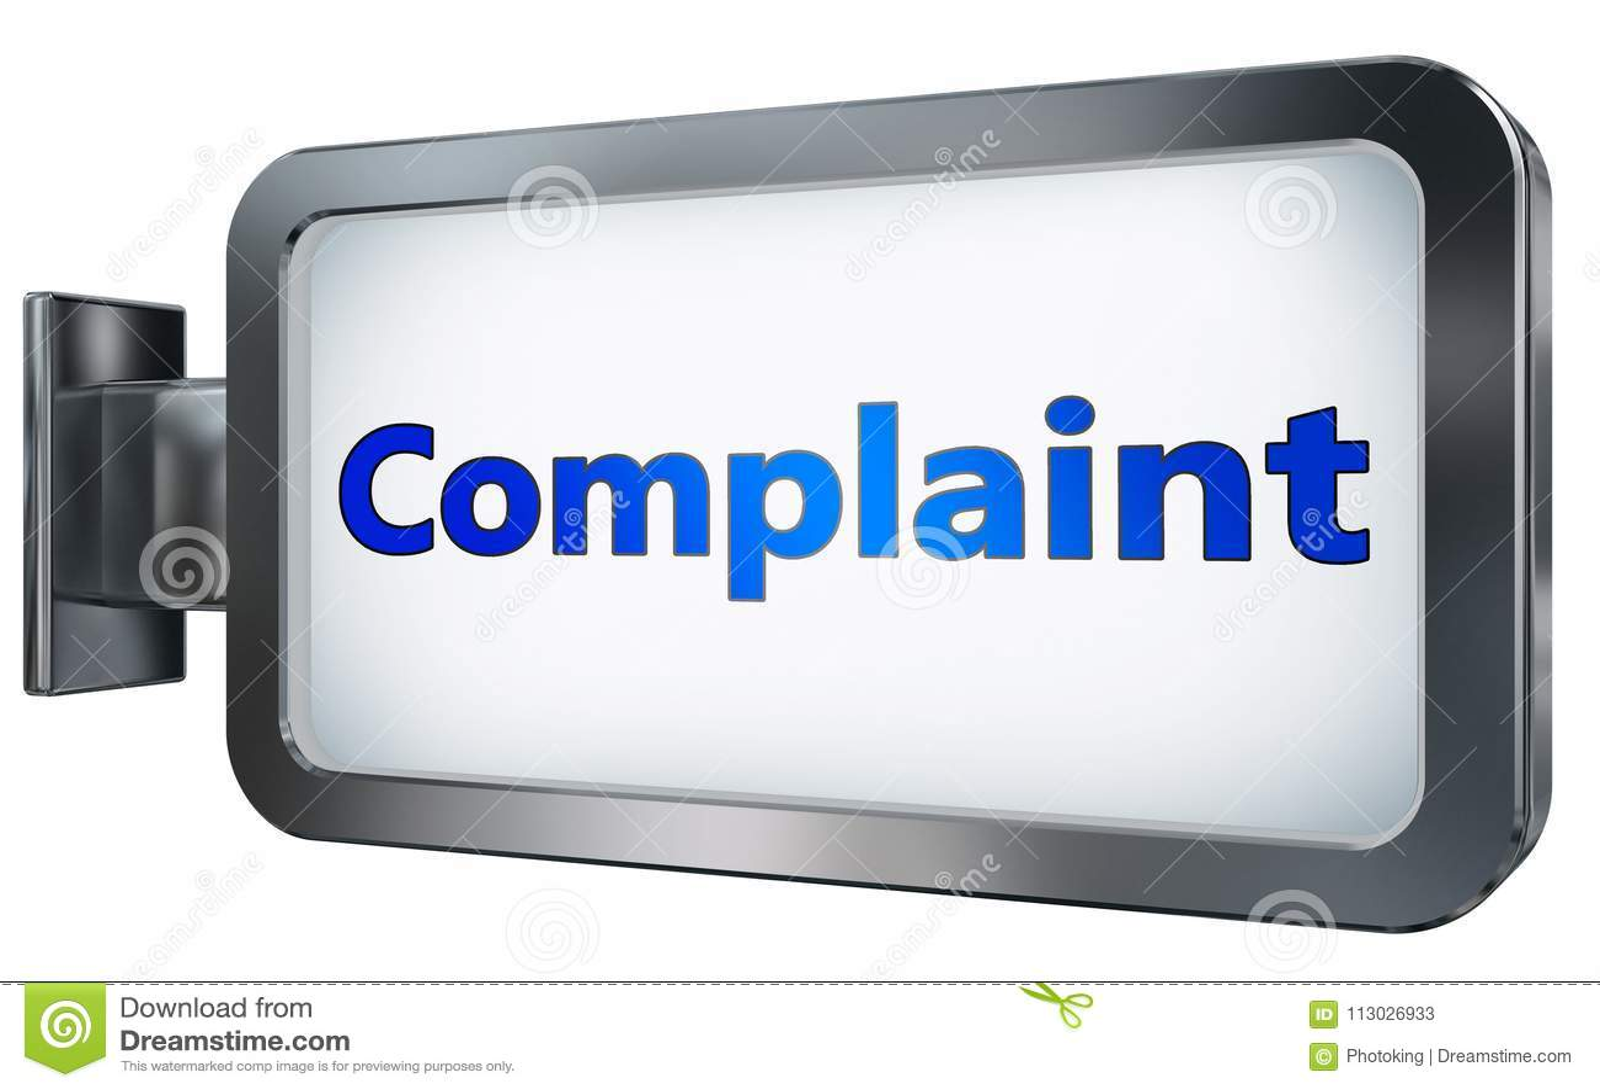 Complaint on billboard background